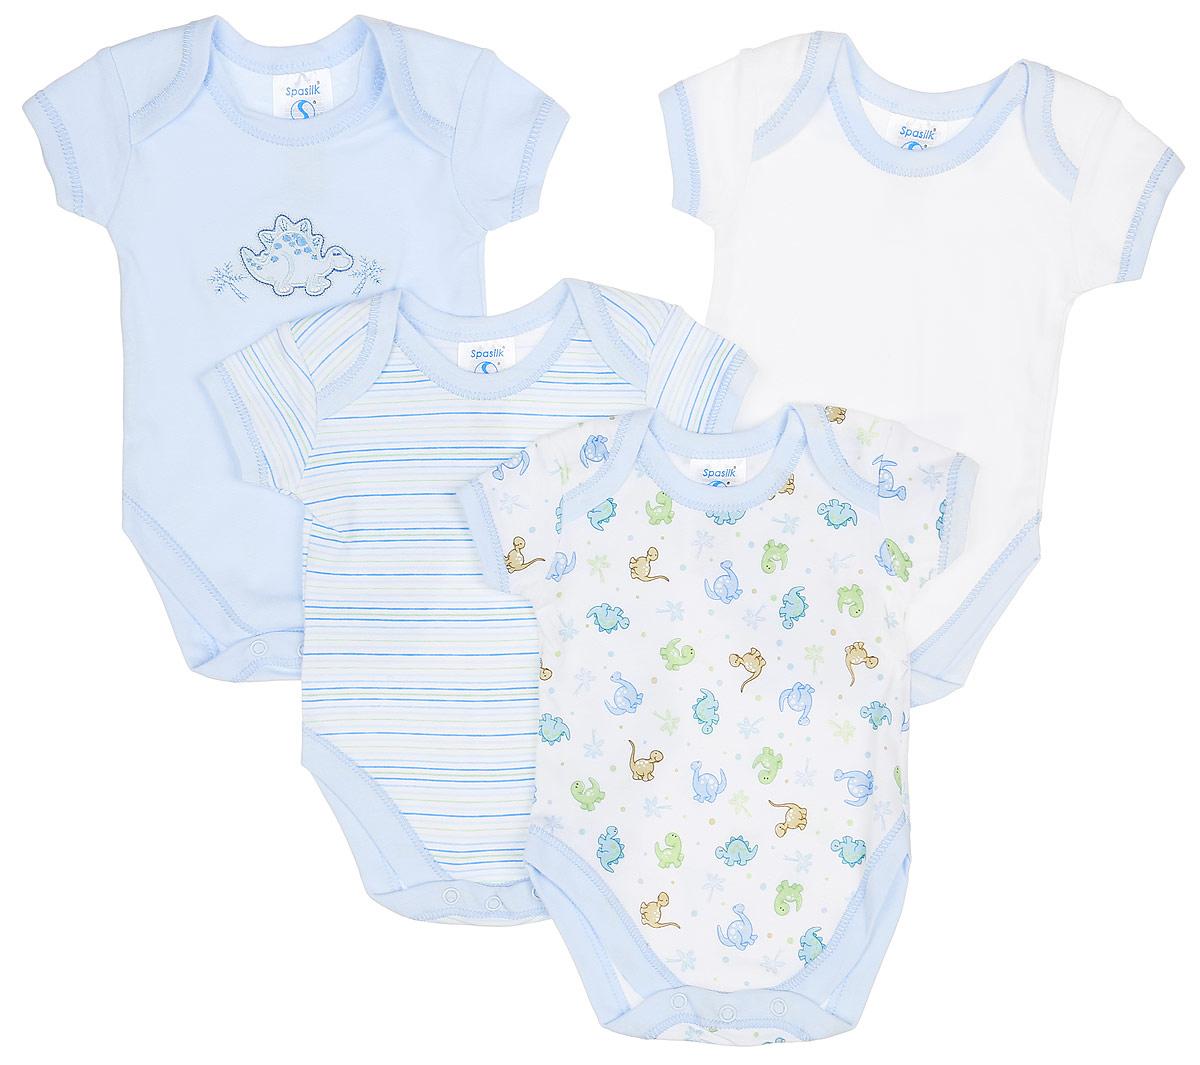 Боди для мальчика Spasilk, цвет: белый, голубой, зеленый, 4 шт. ON S4HS2. Размер XXL, 18 месяцев боди для мальчика spasilk цвет белый голубой зеленый 4 шт on s4hs2 размер xxl 18 месяцев